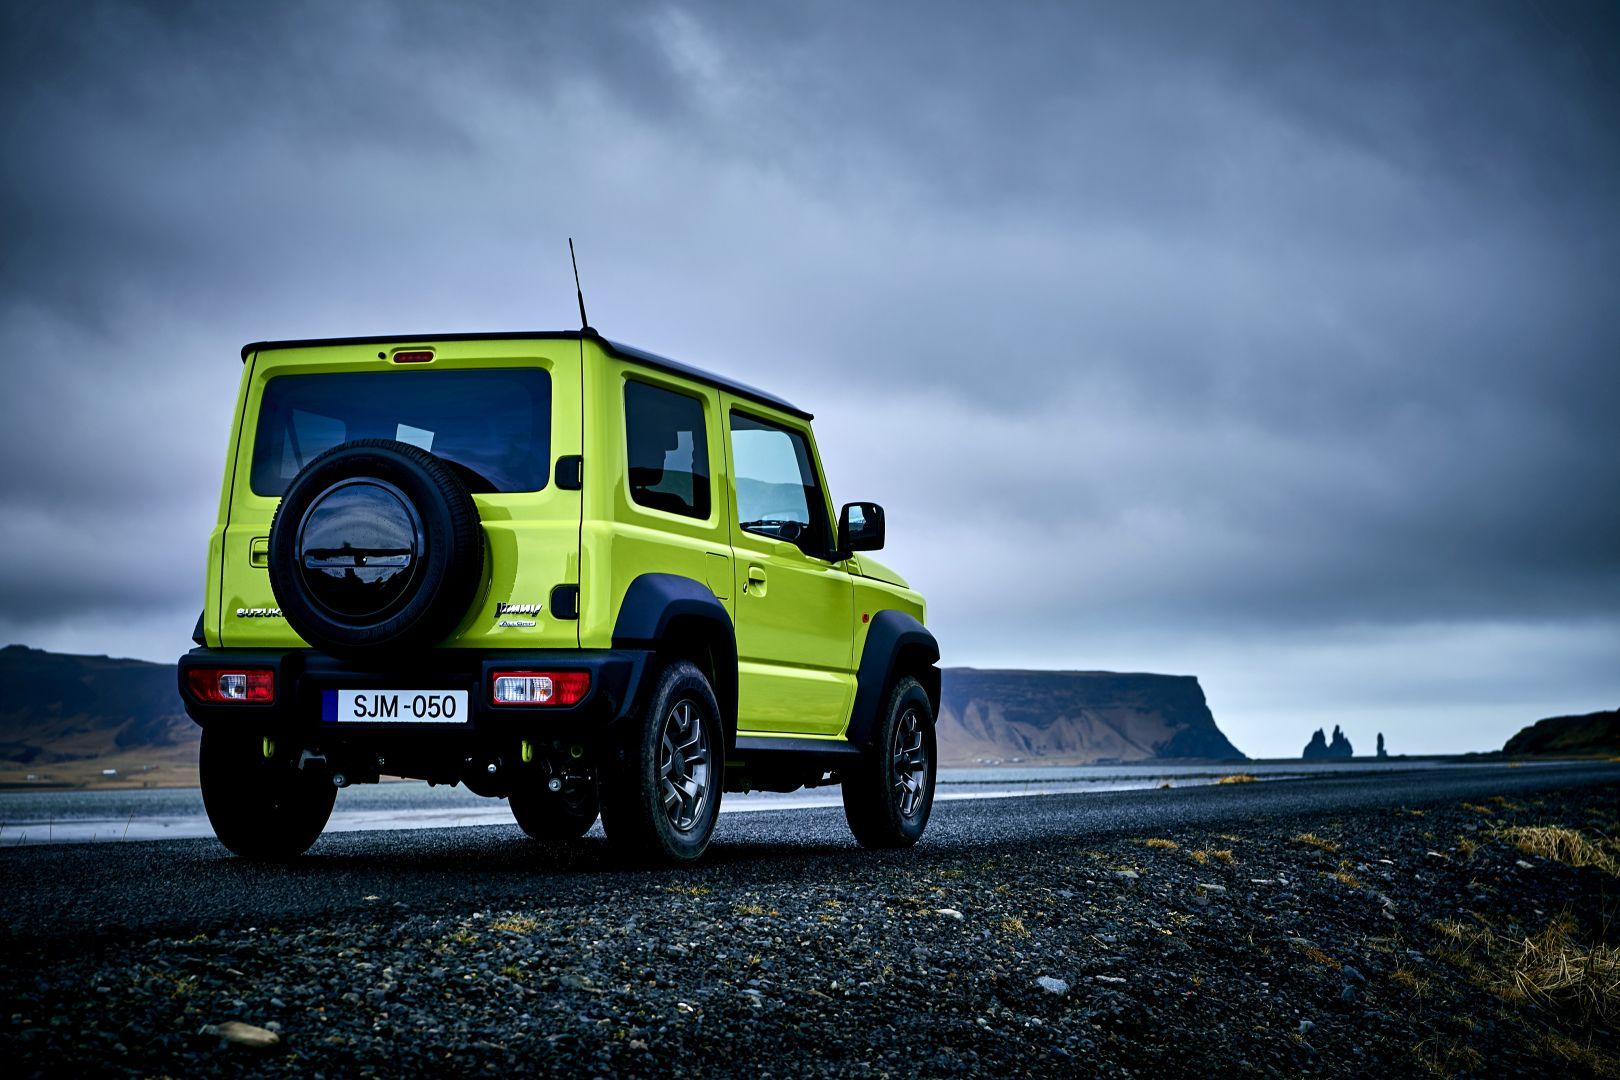 Suzuki Jimny HD Wallpapers: More David than Goliath ...